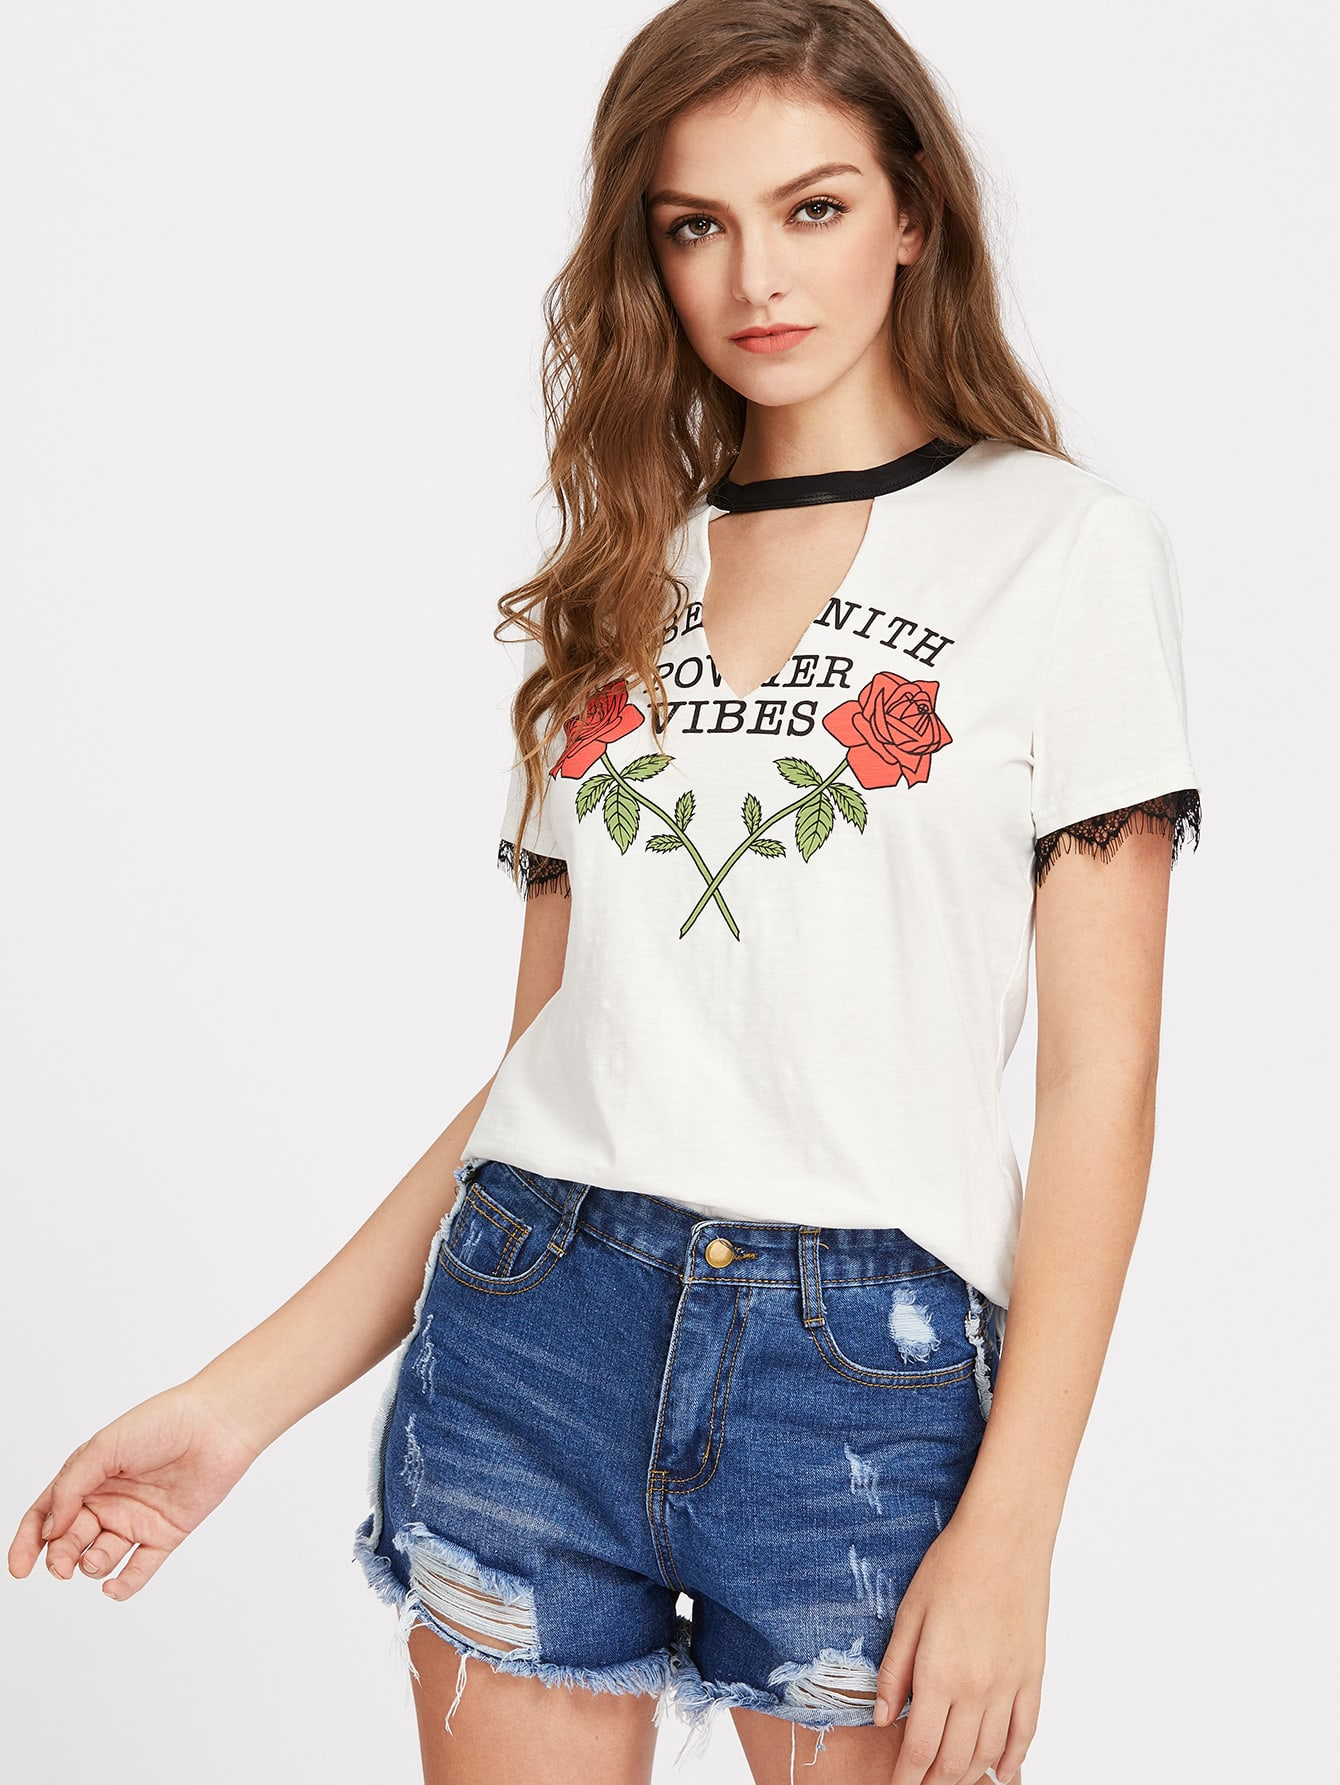 Short Sleeve T Shirts For Women